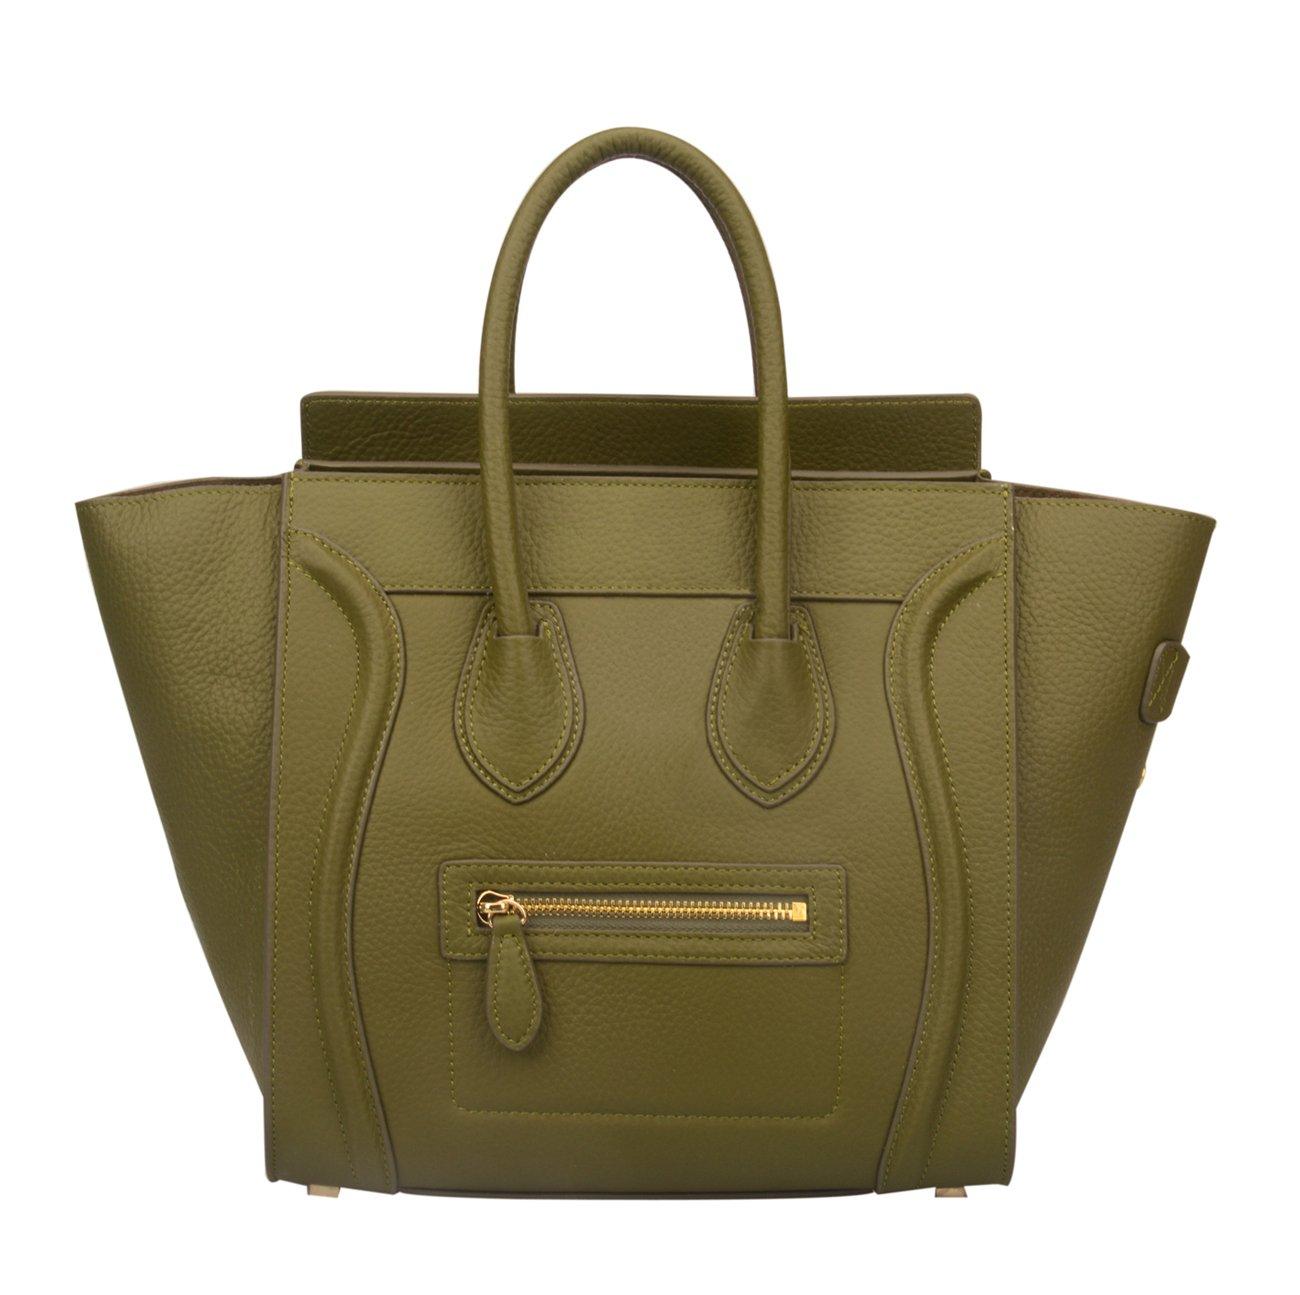 Ainifeel Women's Genuine Leather Smile Top Handle Handbag Purse (Medium, Military)